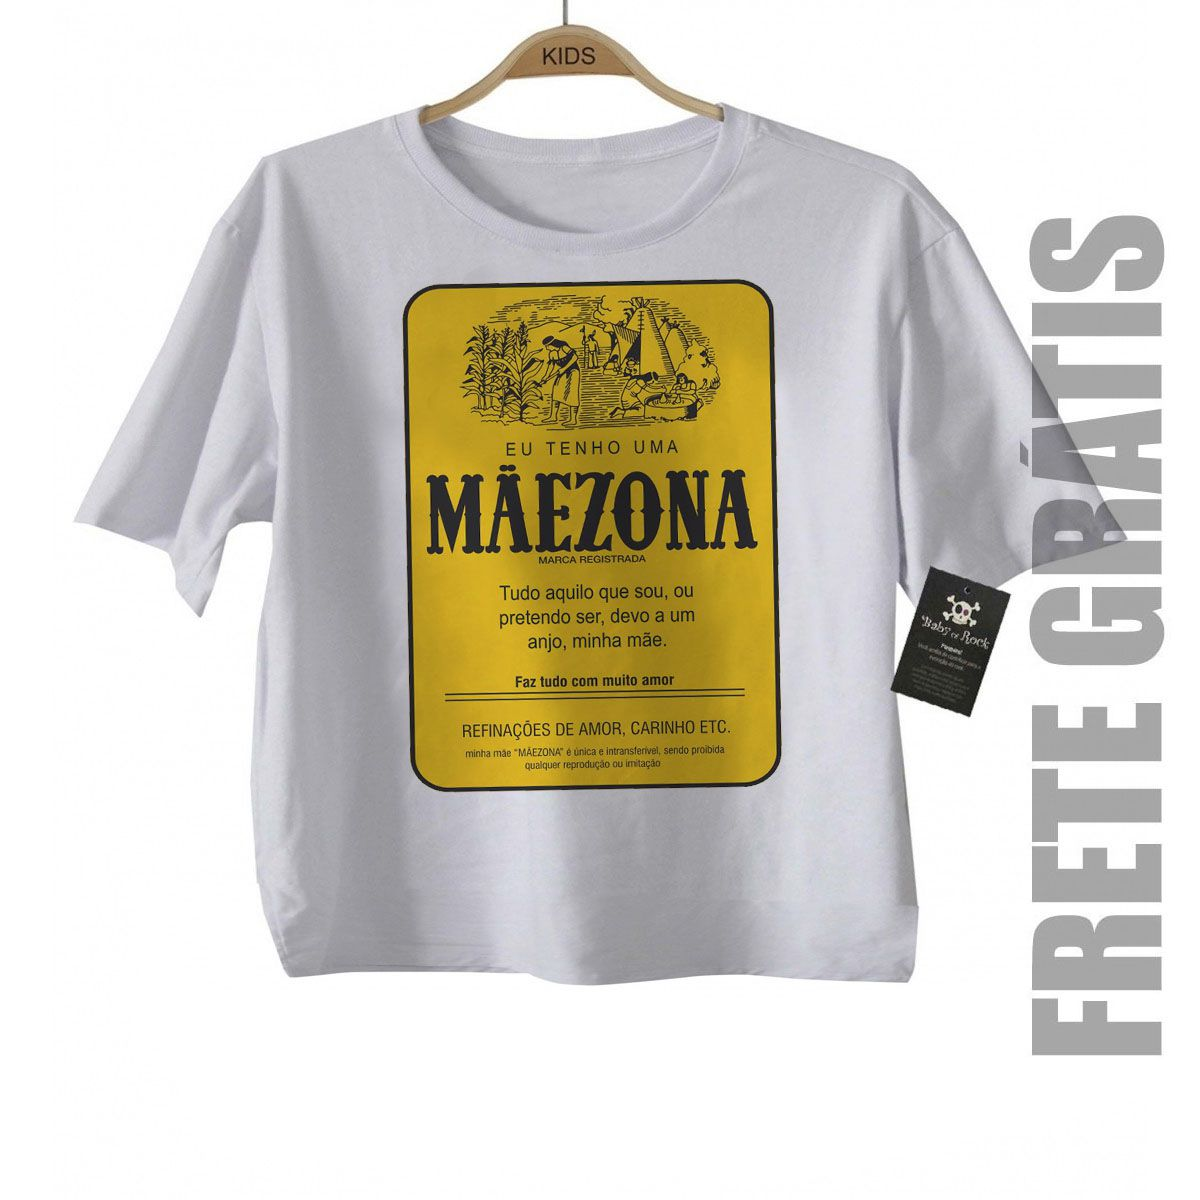 Camiseta Infantil  Especial para Mãe Mãezona - White  - Baby Monster S/A